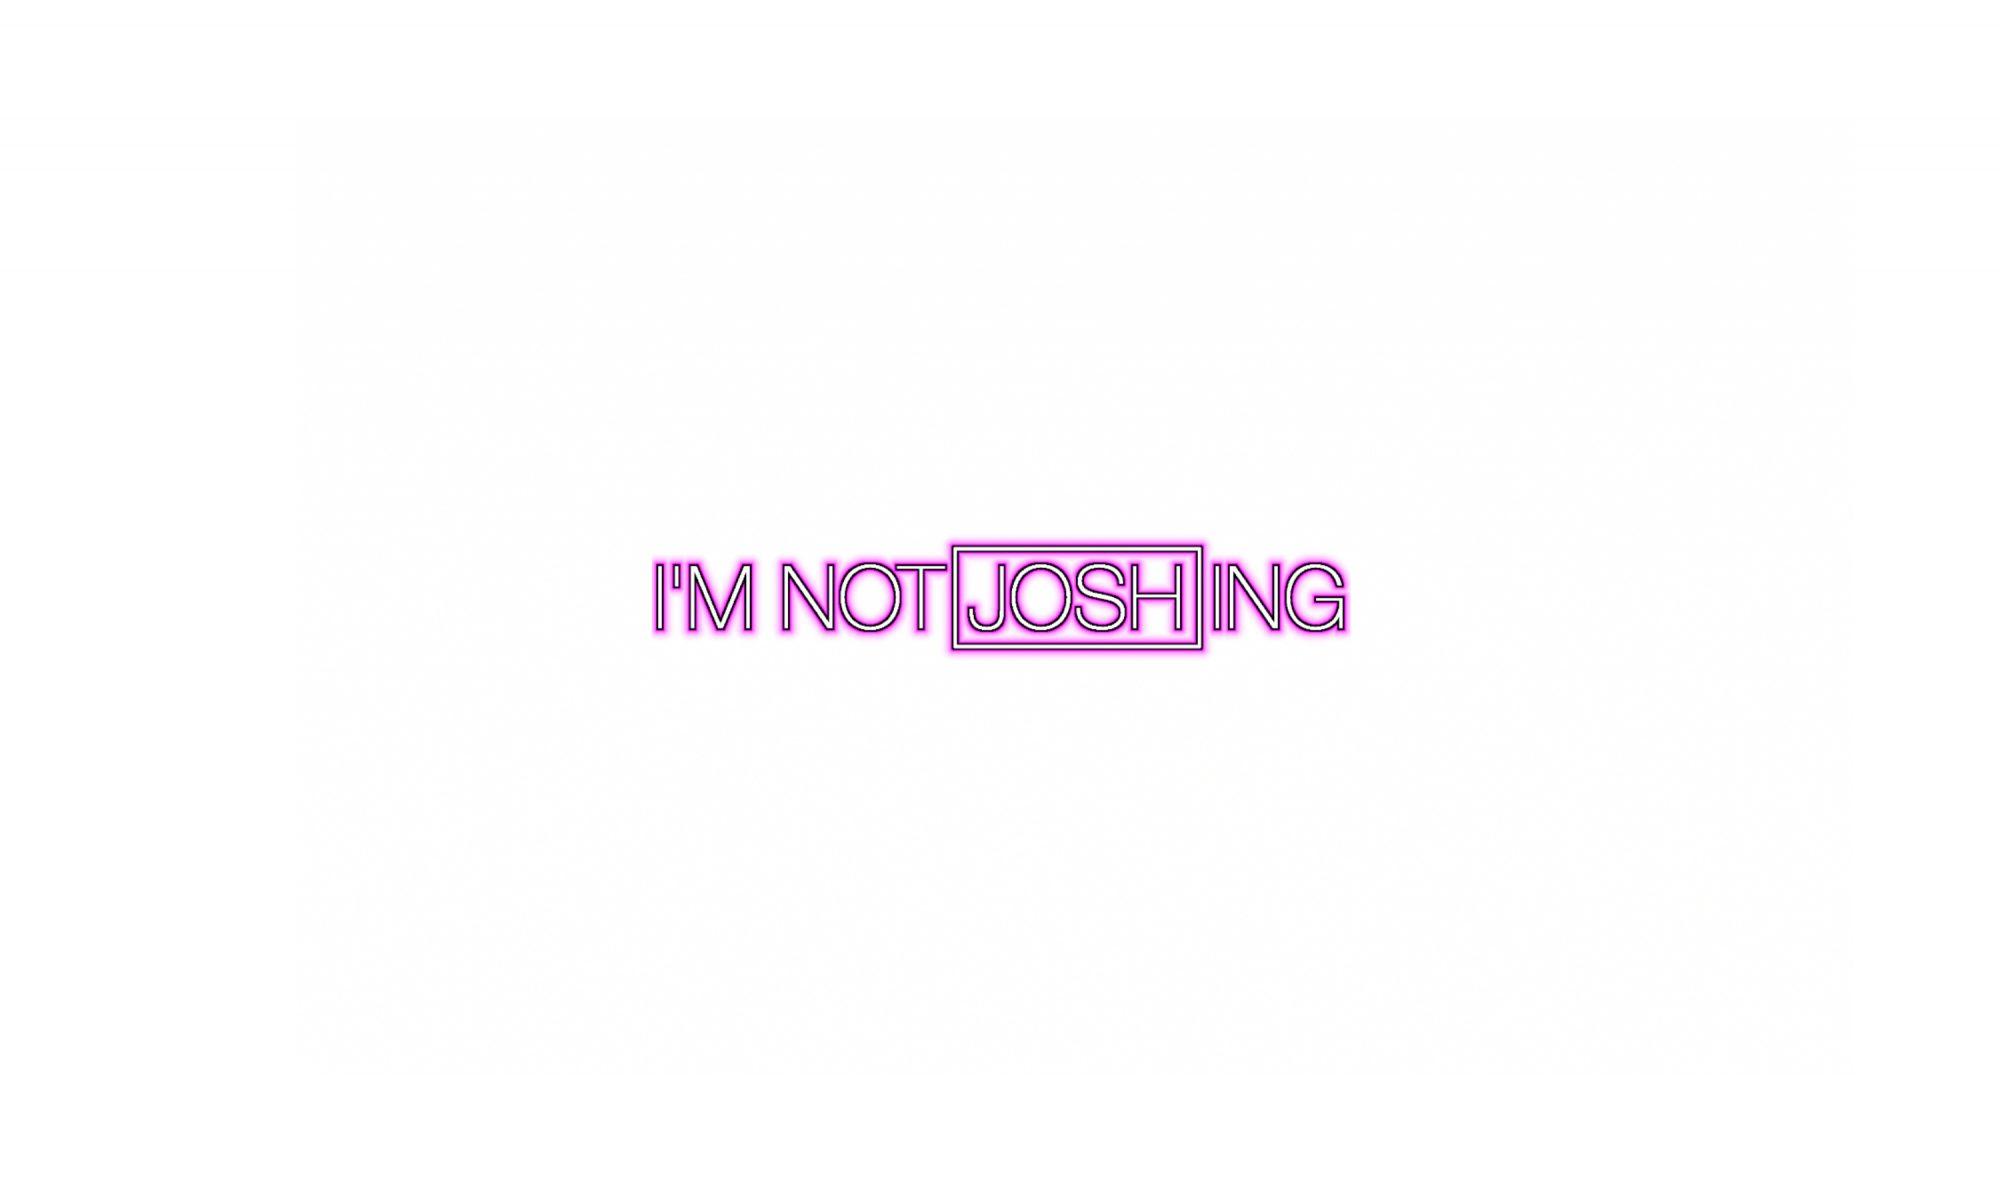 I'M NOT JOSHING